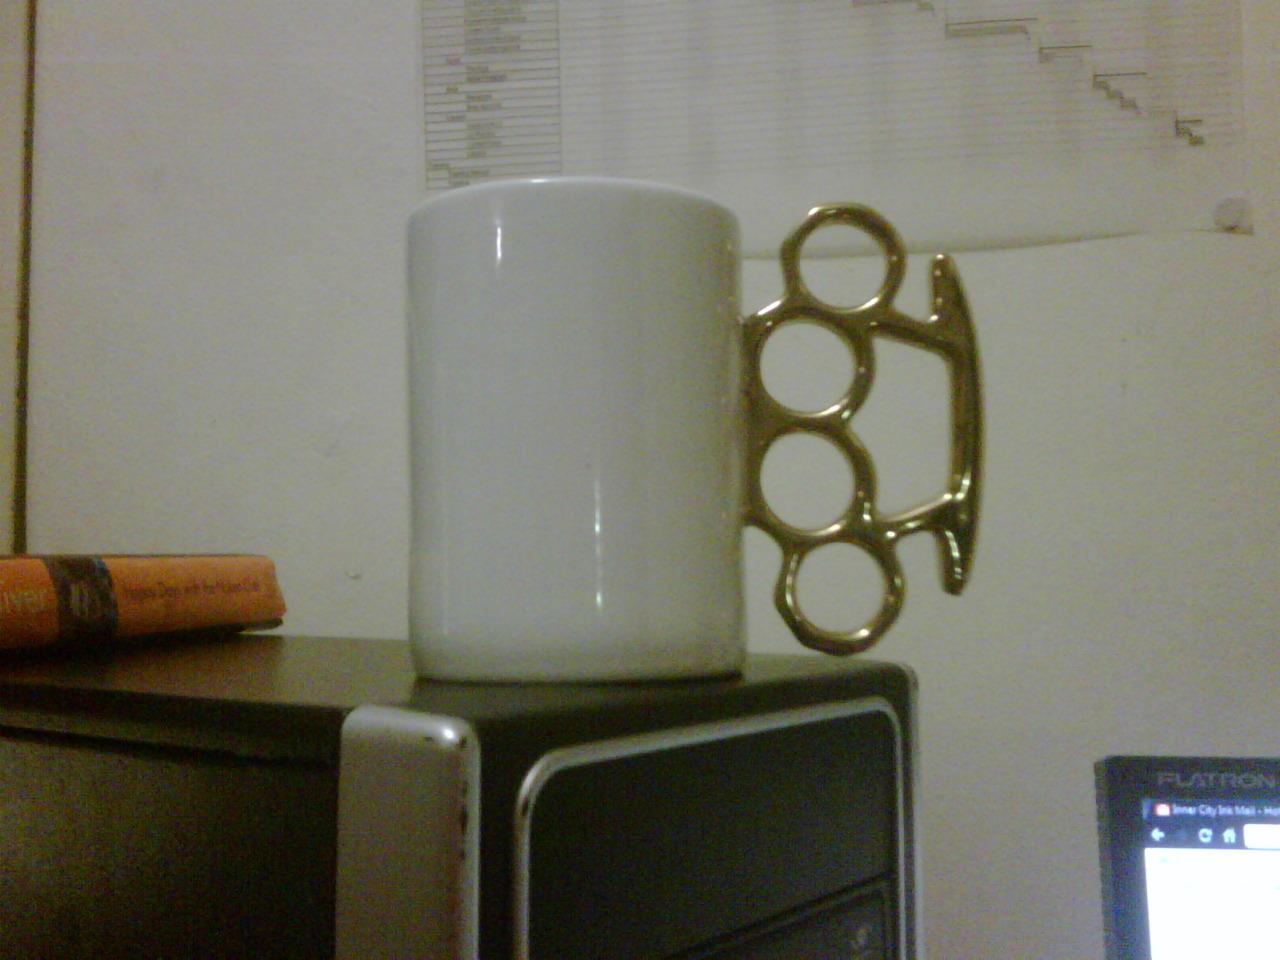 My new Fistycup! Thanks Sammy Girl!